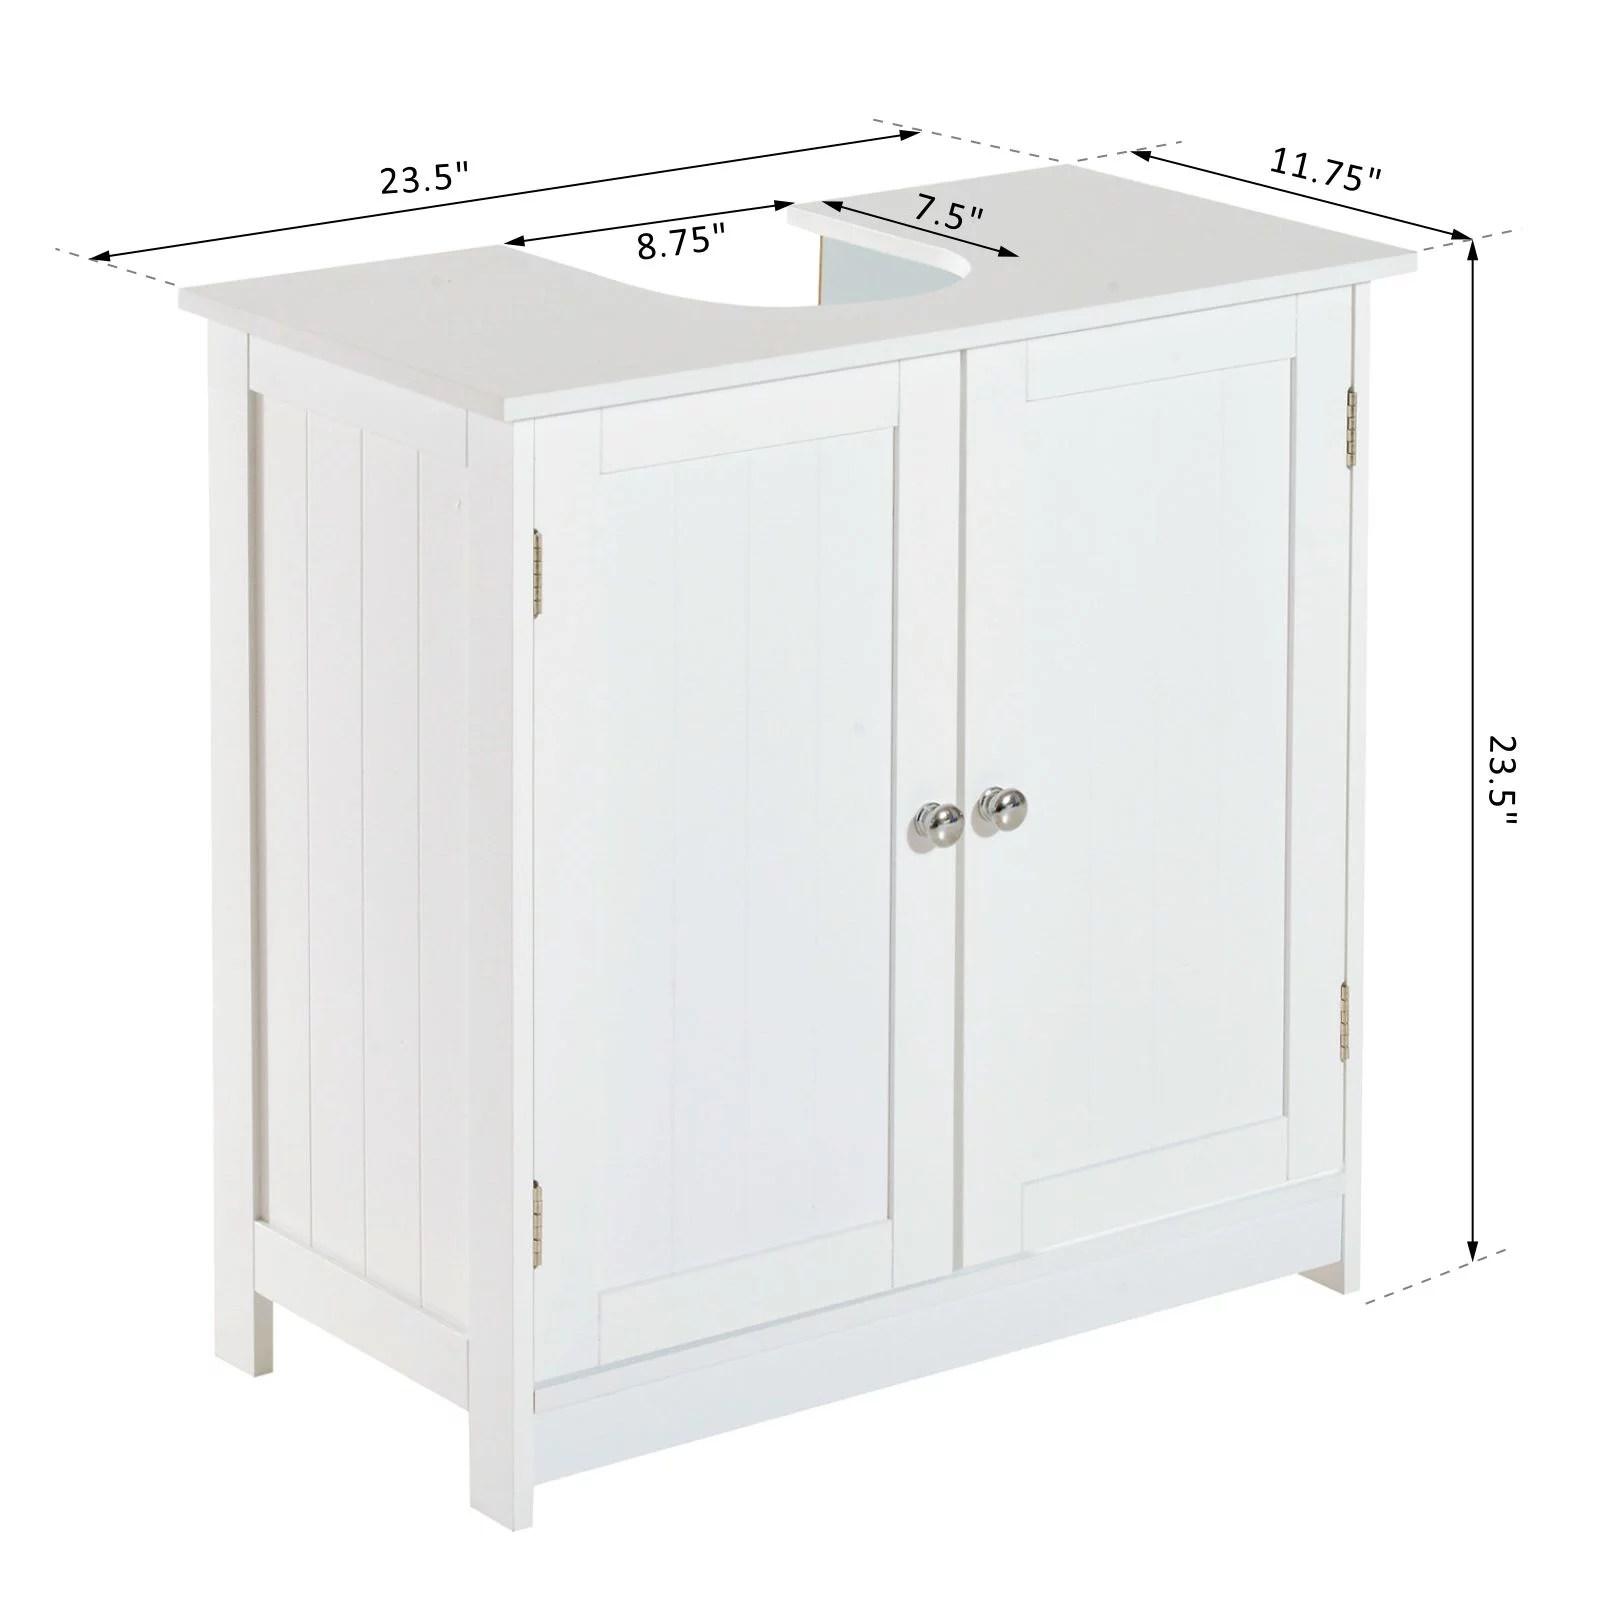 Homcom 24 Pedestal Sink Bathroom Vanity Cabinet White Walmart Com Walmart Com